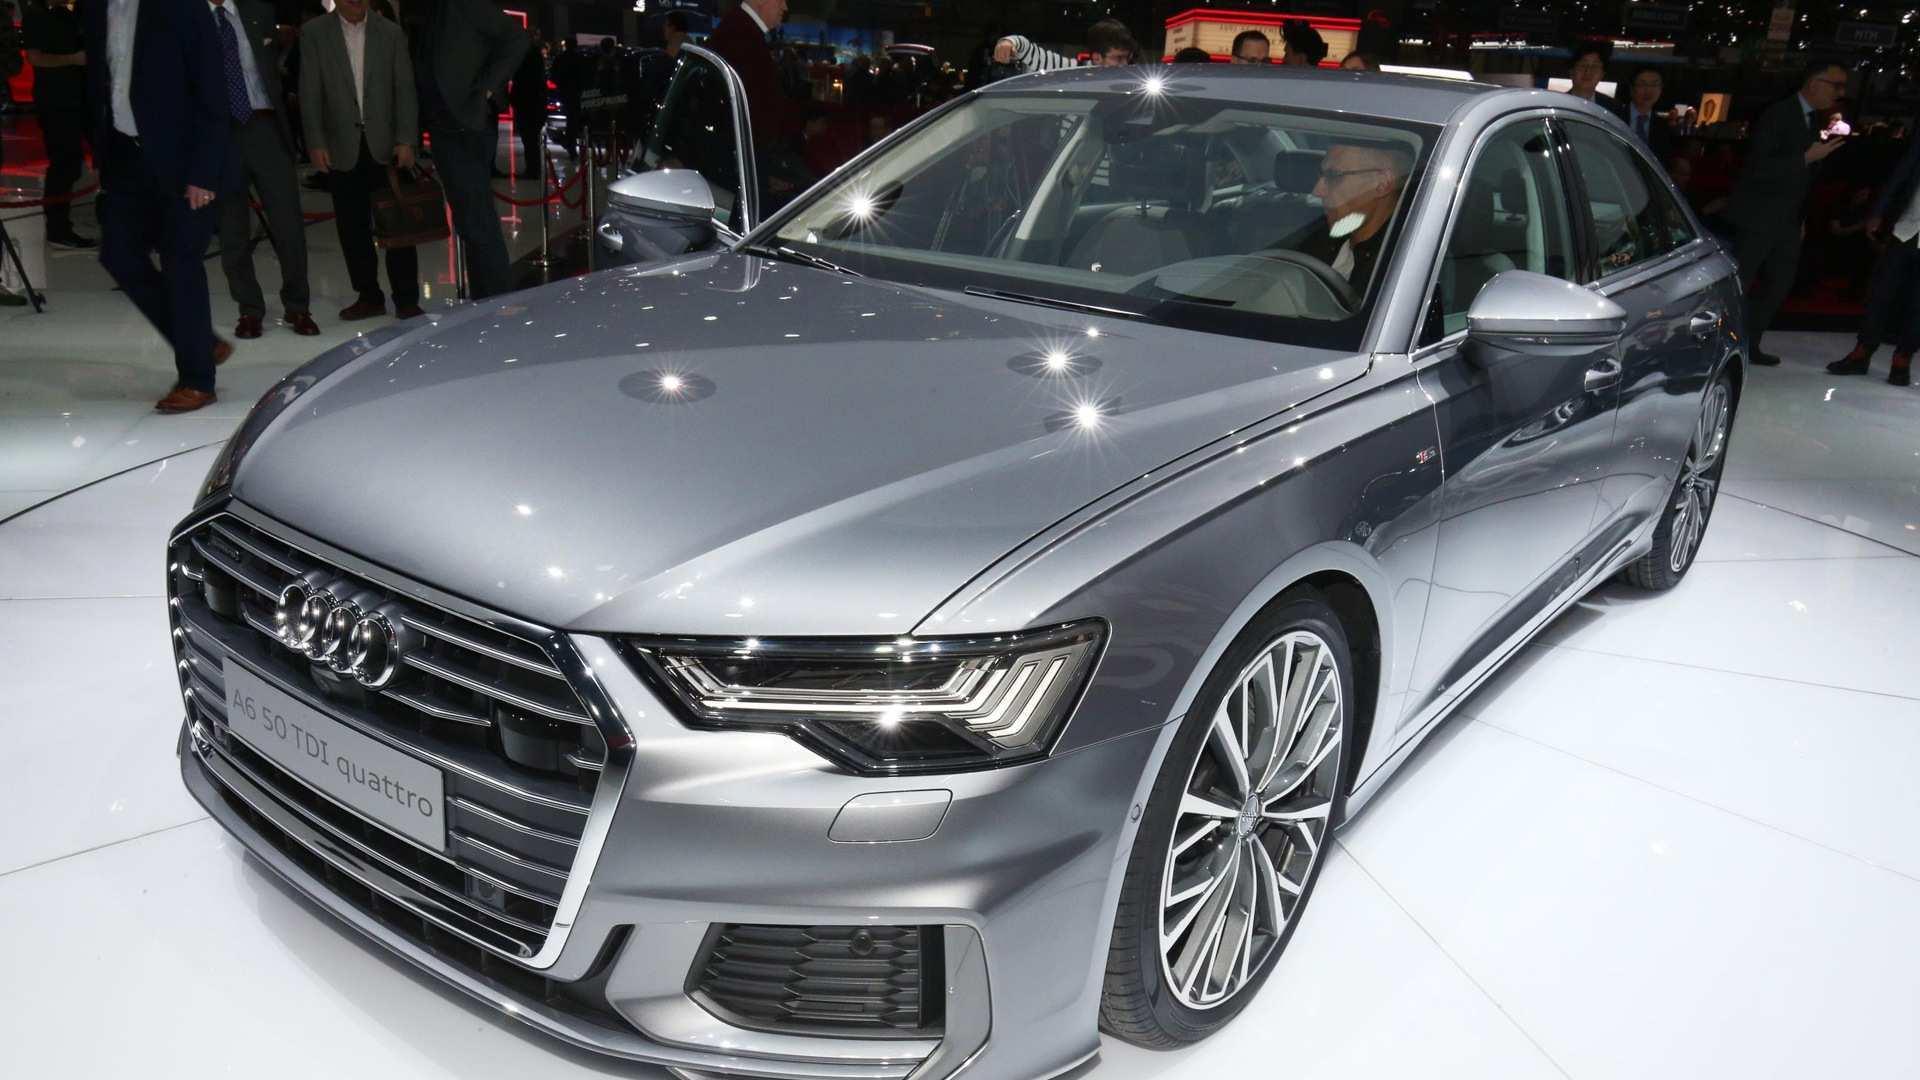 64 Concept of Audi A 2019 Photos with Audi A 2019